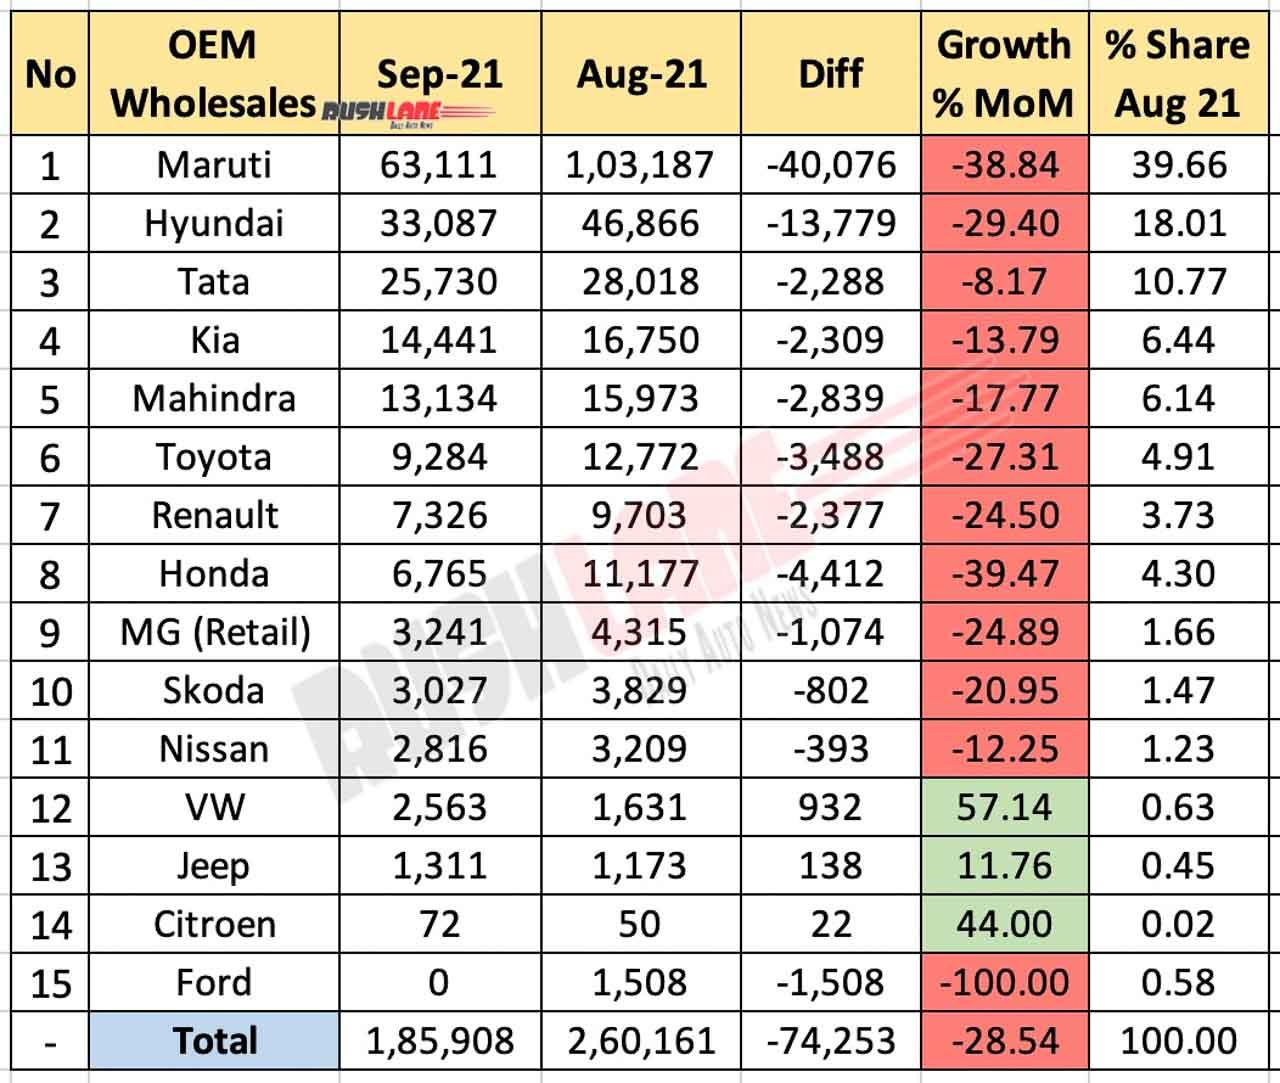 Car Sales September 2021 Vs August 2021 (MoM)